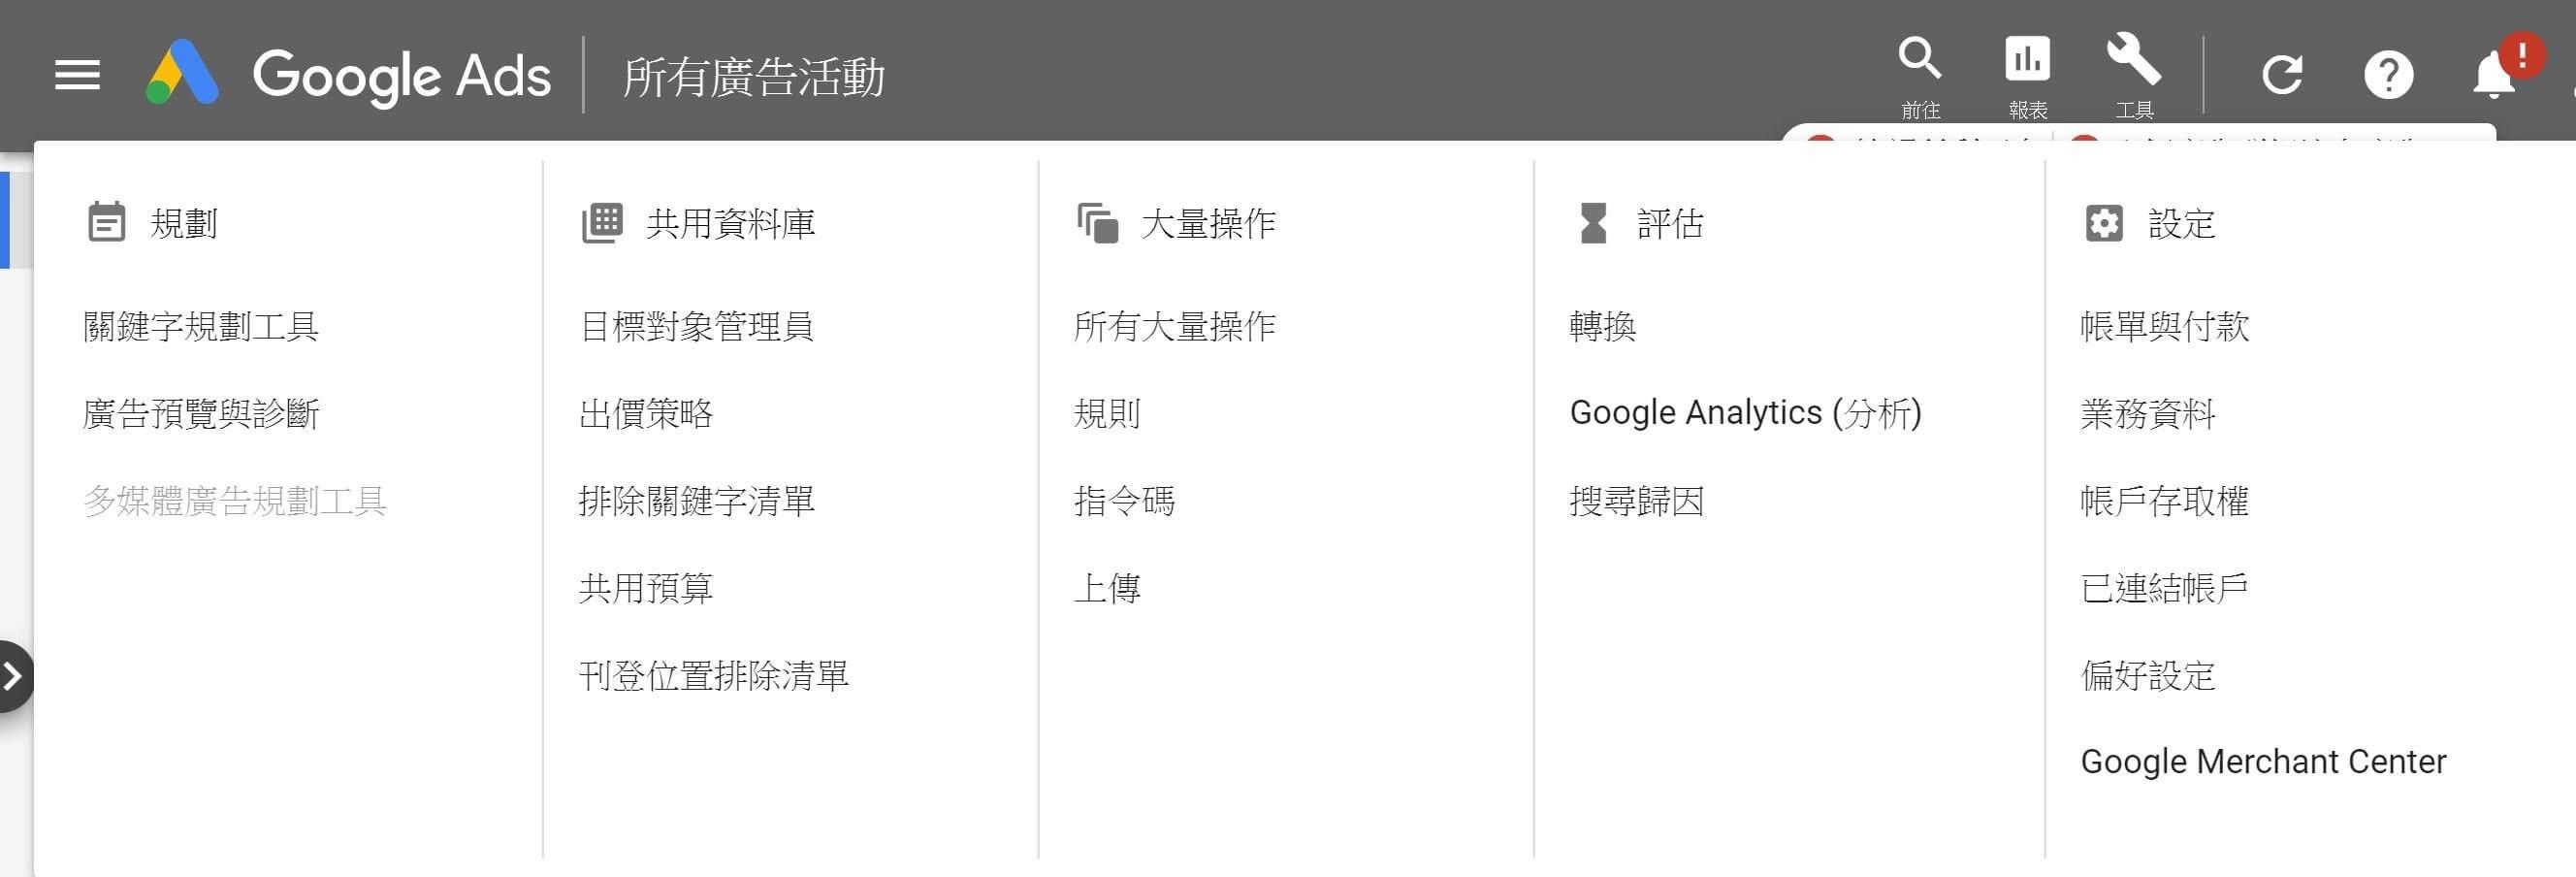 Google Ads工具